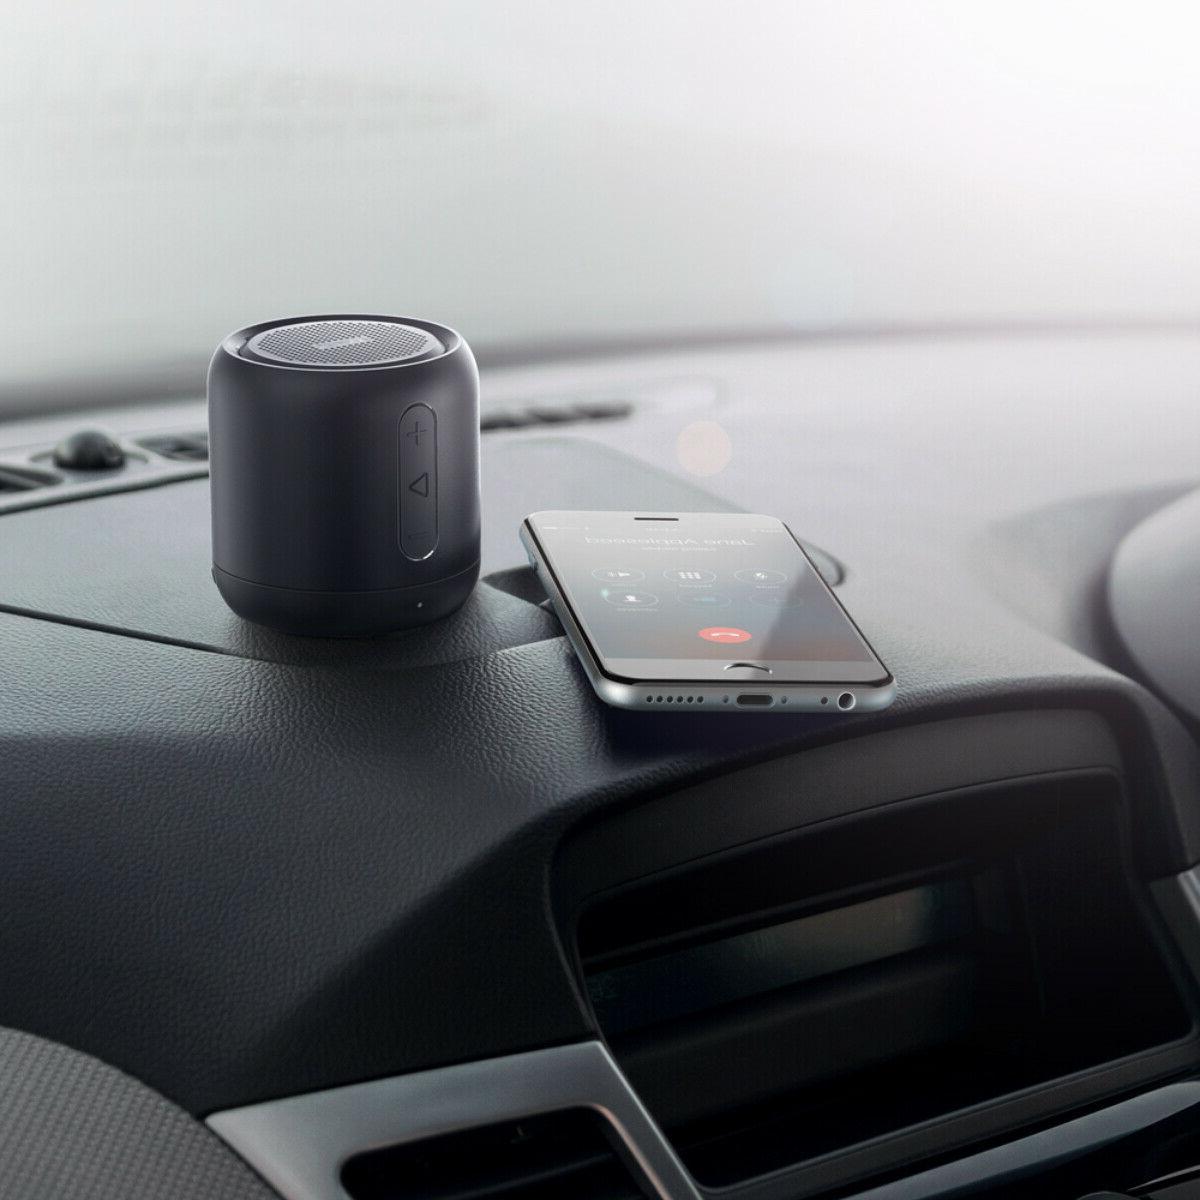 Anker Soundcore Bluetooth Speaker Enhanced Microphone